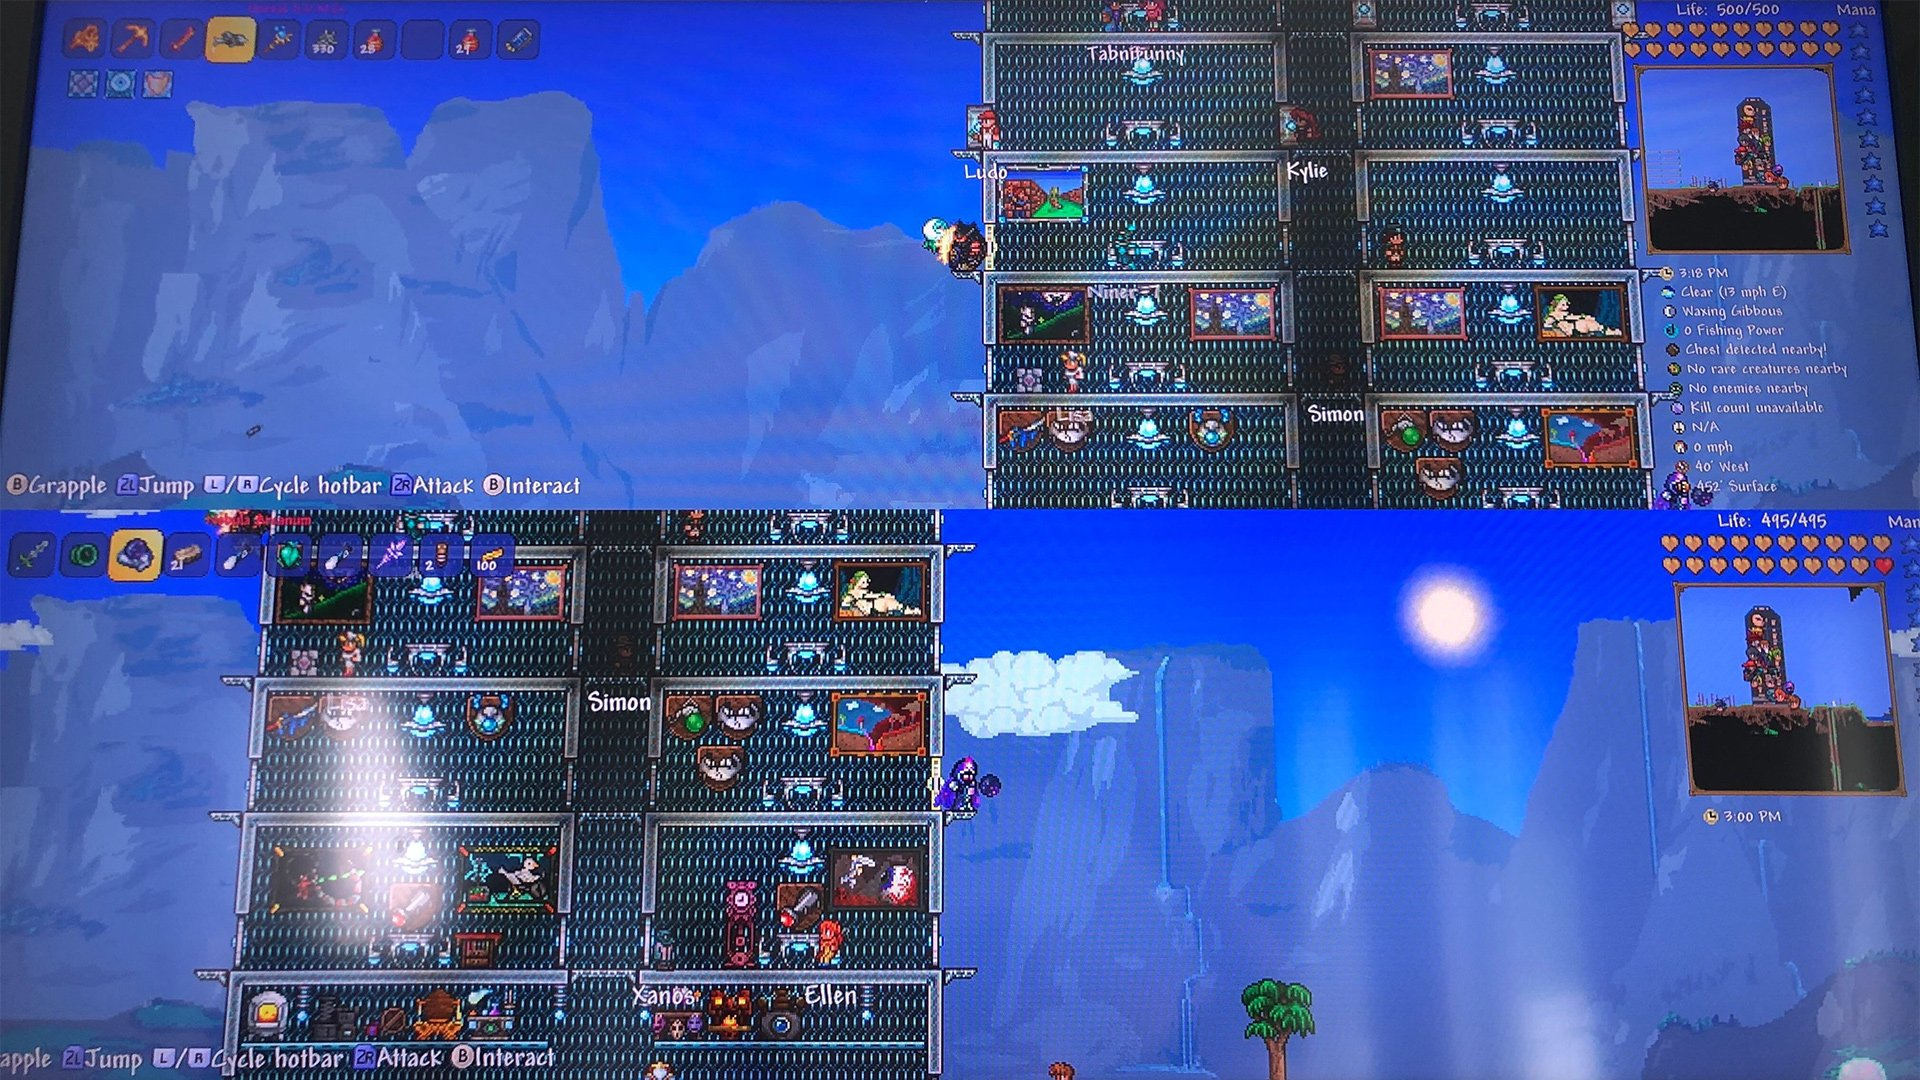 Terraria got a Switch update for two-player split-screen co-op screenshot